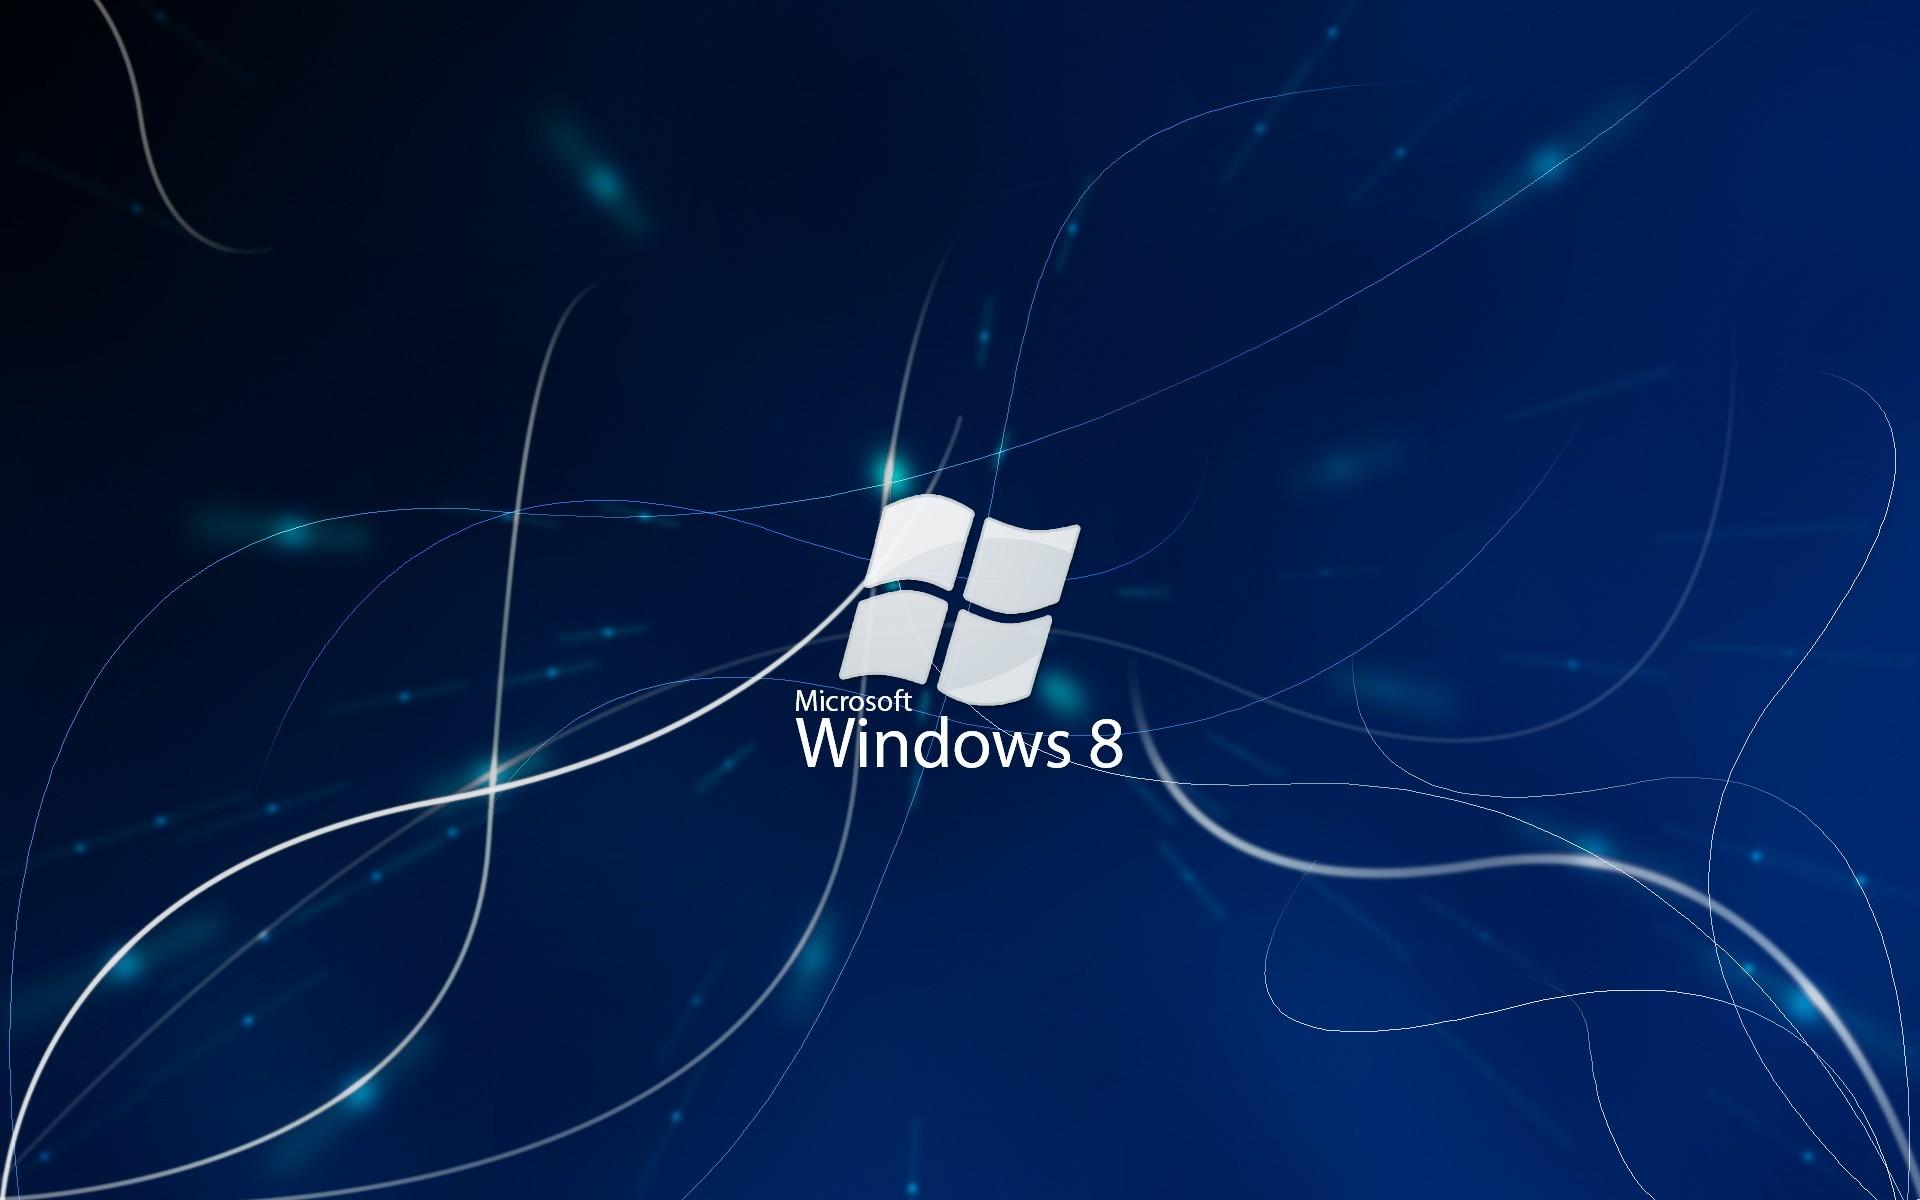 Wallpaper Windows 8 загрузить